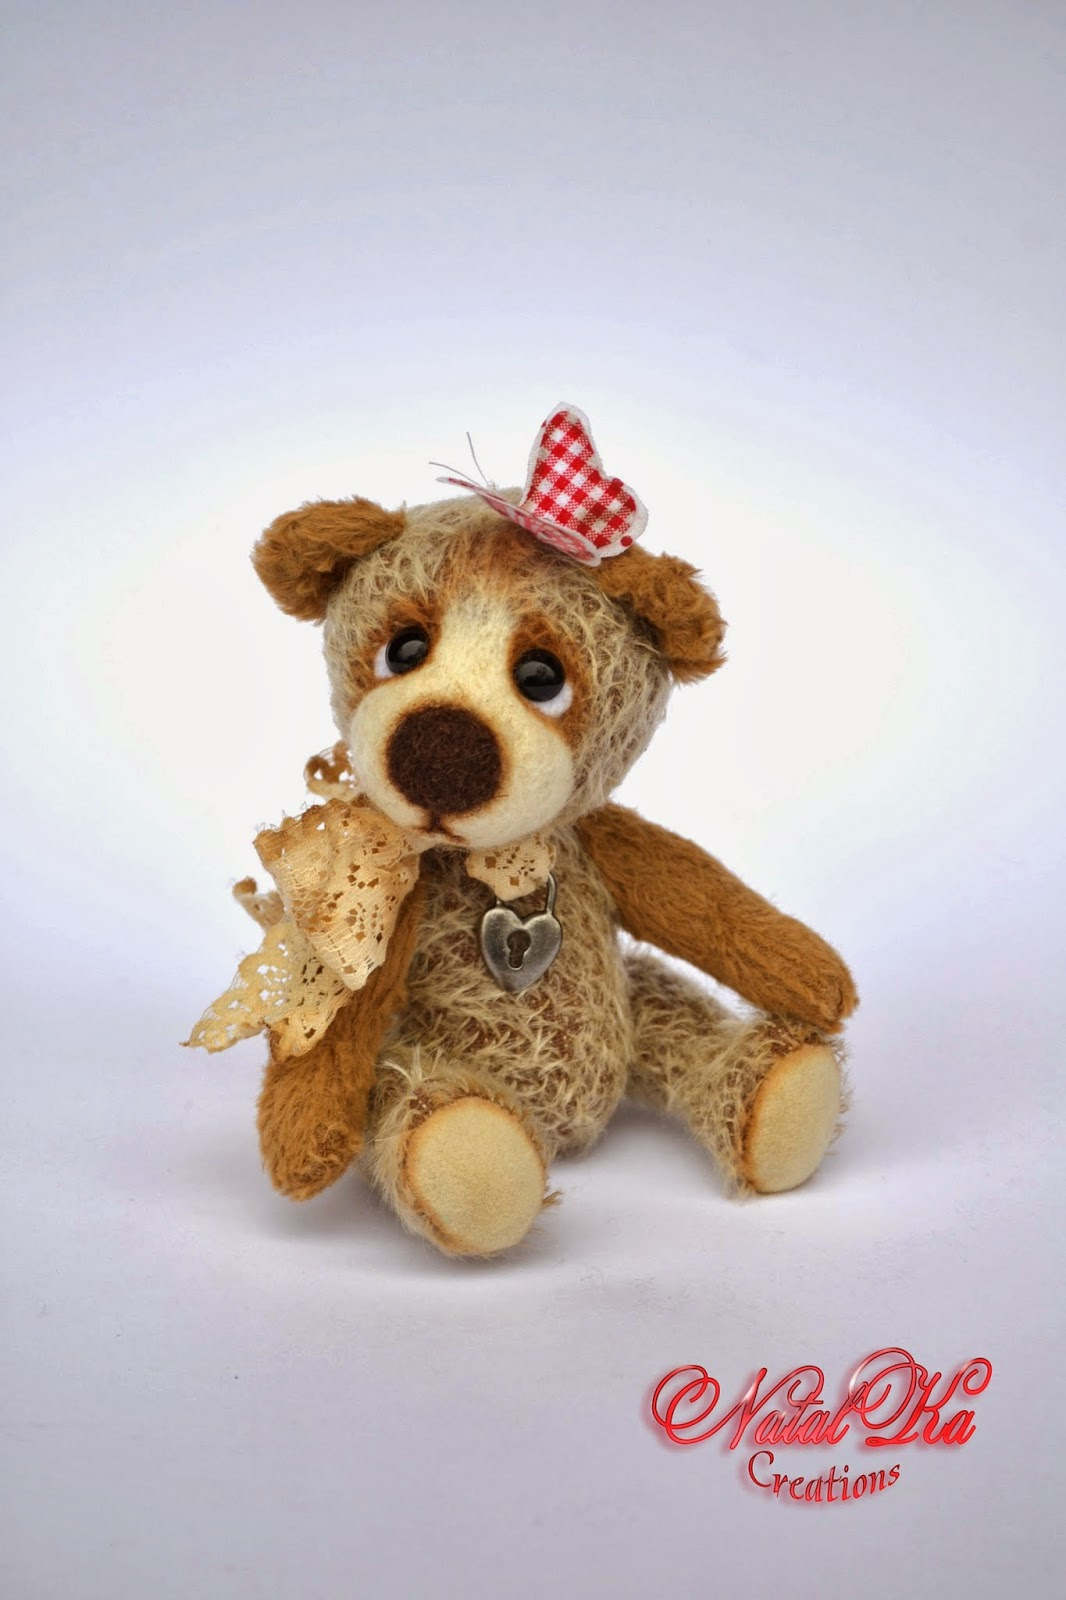 Авторский мишка тедди ручной работы от NatalKa Creations. Artist teddy bear handmade by NatalKa Creations